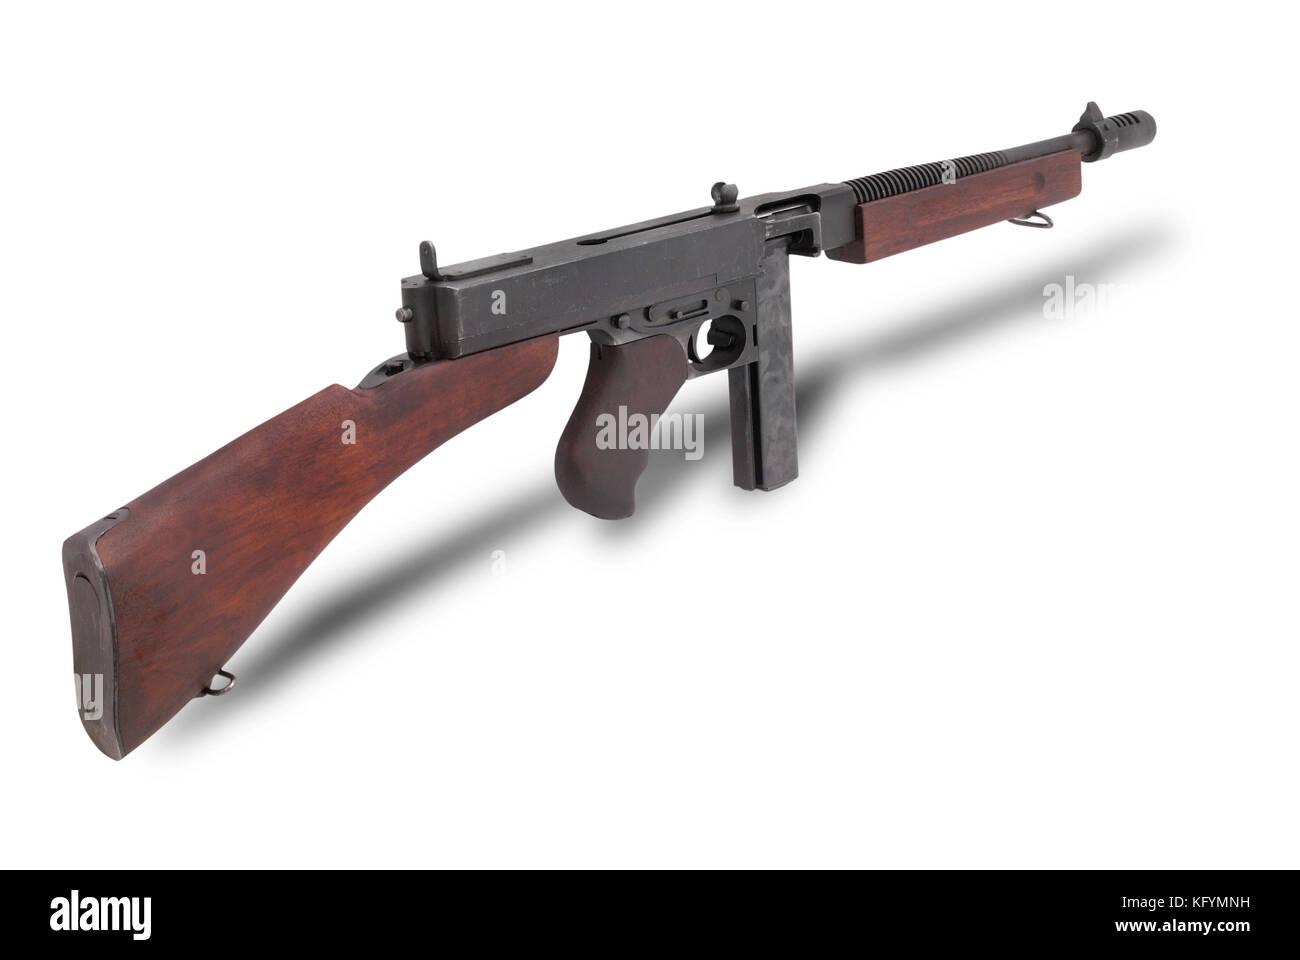 Thompson Machine Gun Stock Photos & Thompson Machine Gun